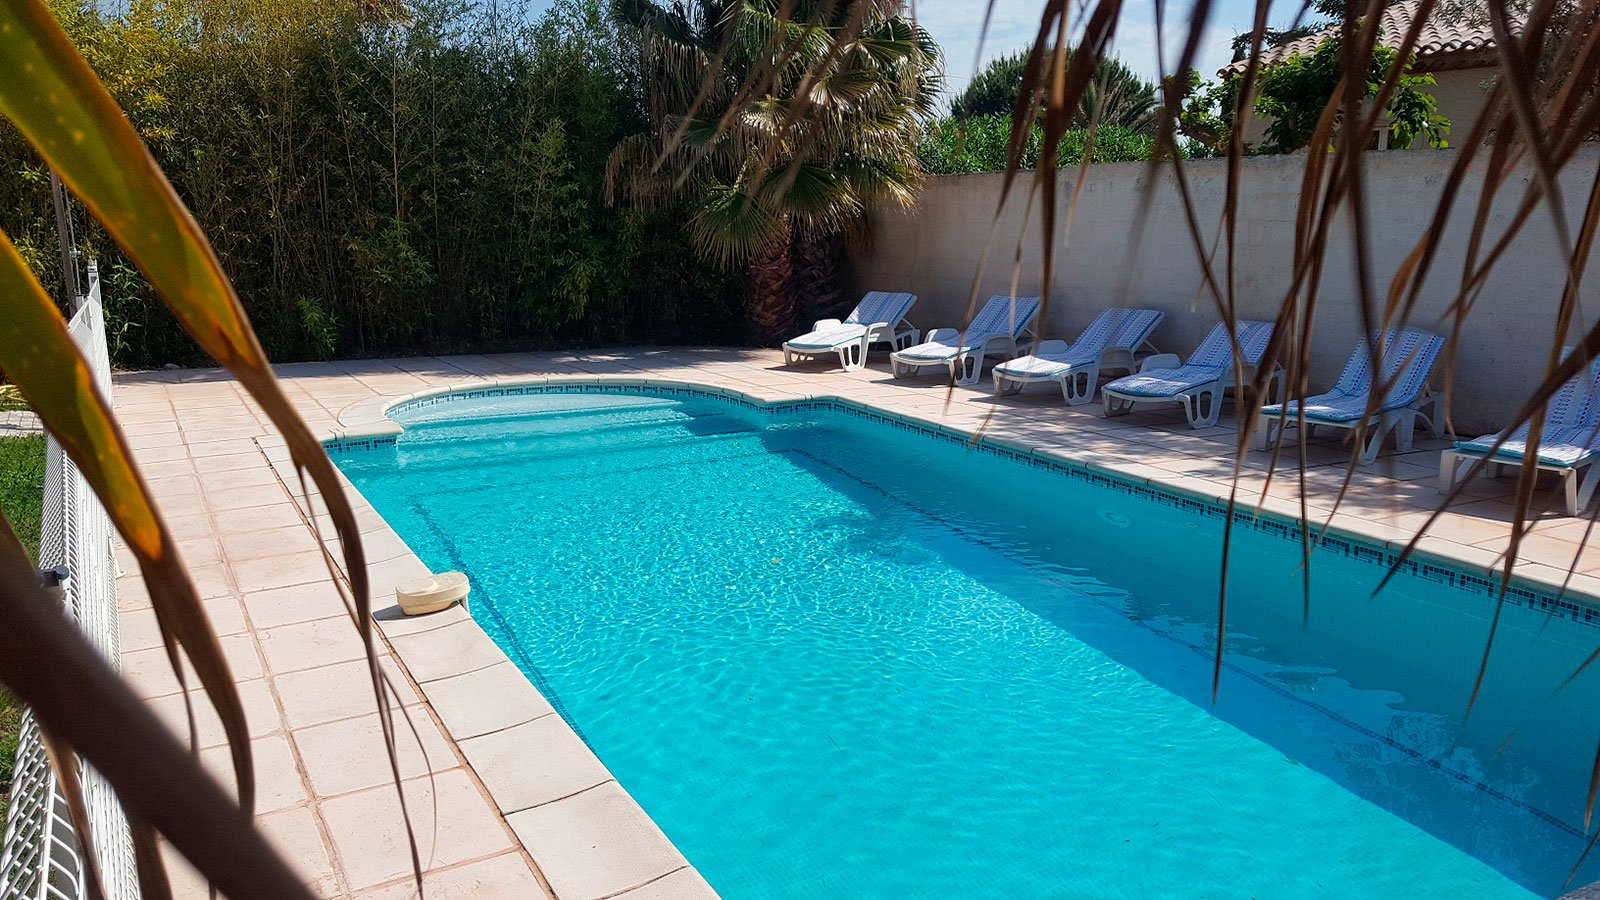 la-villa-aux-mimosas-la-piscine-privee-chauffee-et-au-sel